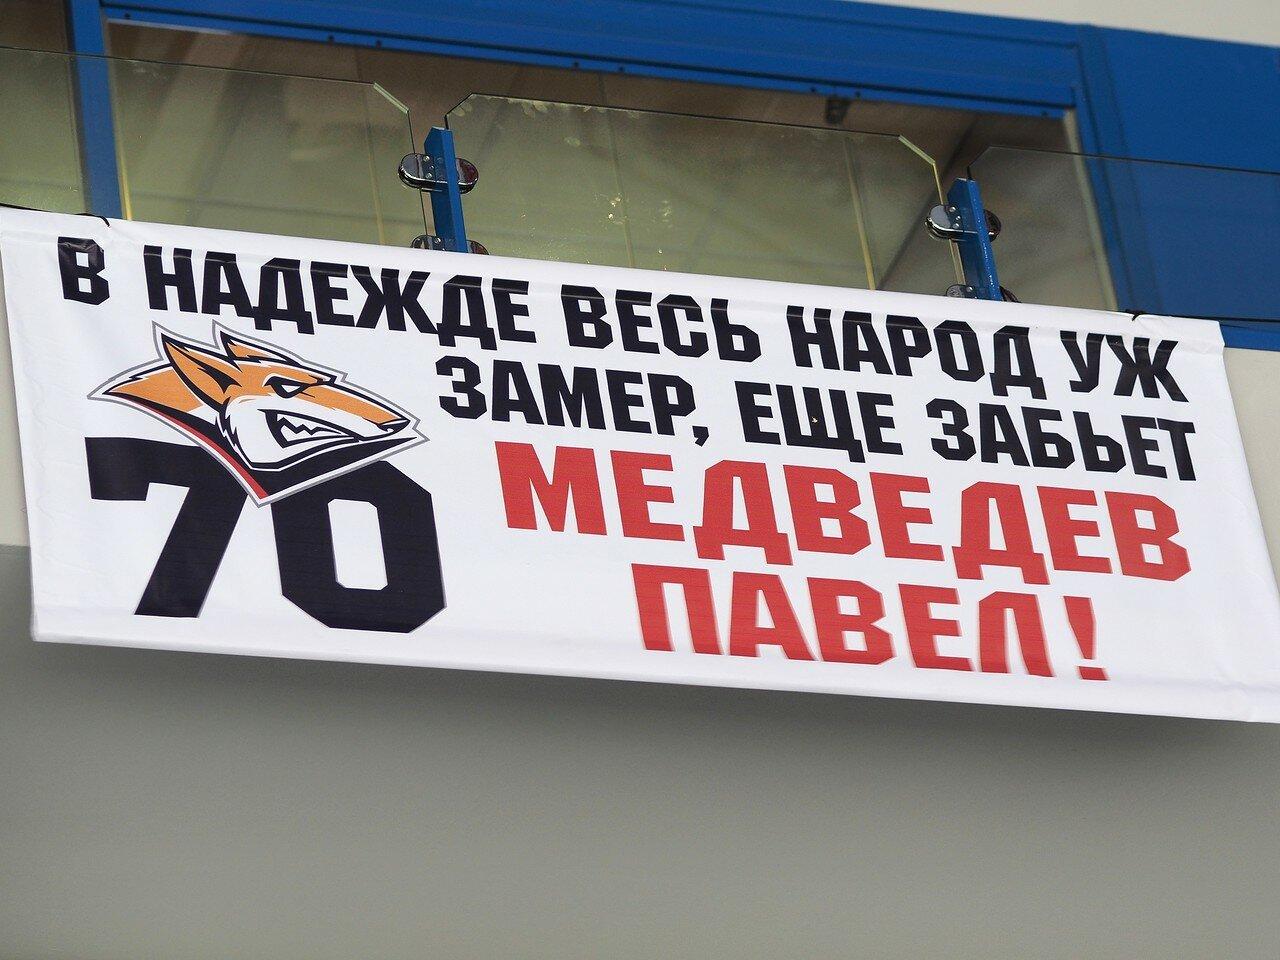 143Восток 1/2 плей-офф Металлург - Сибирь 08.03.2016